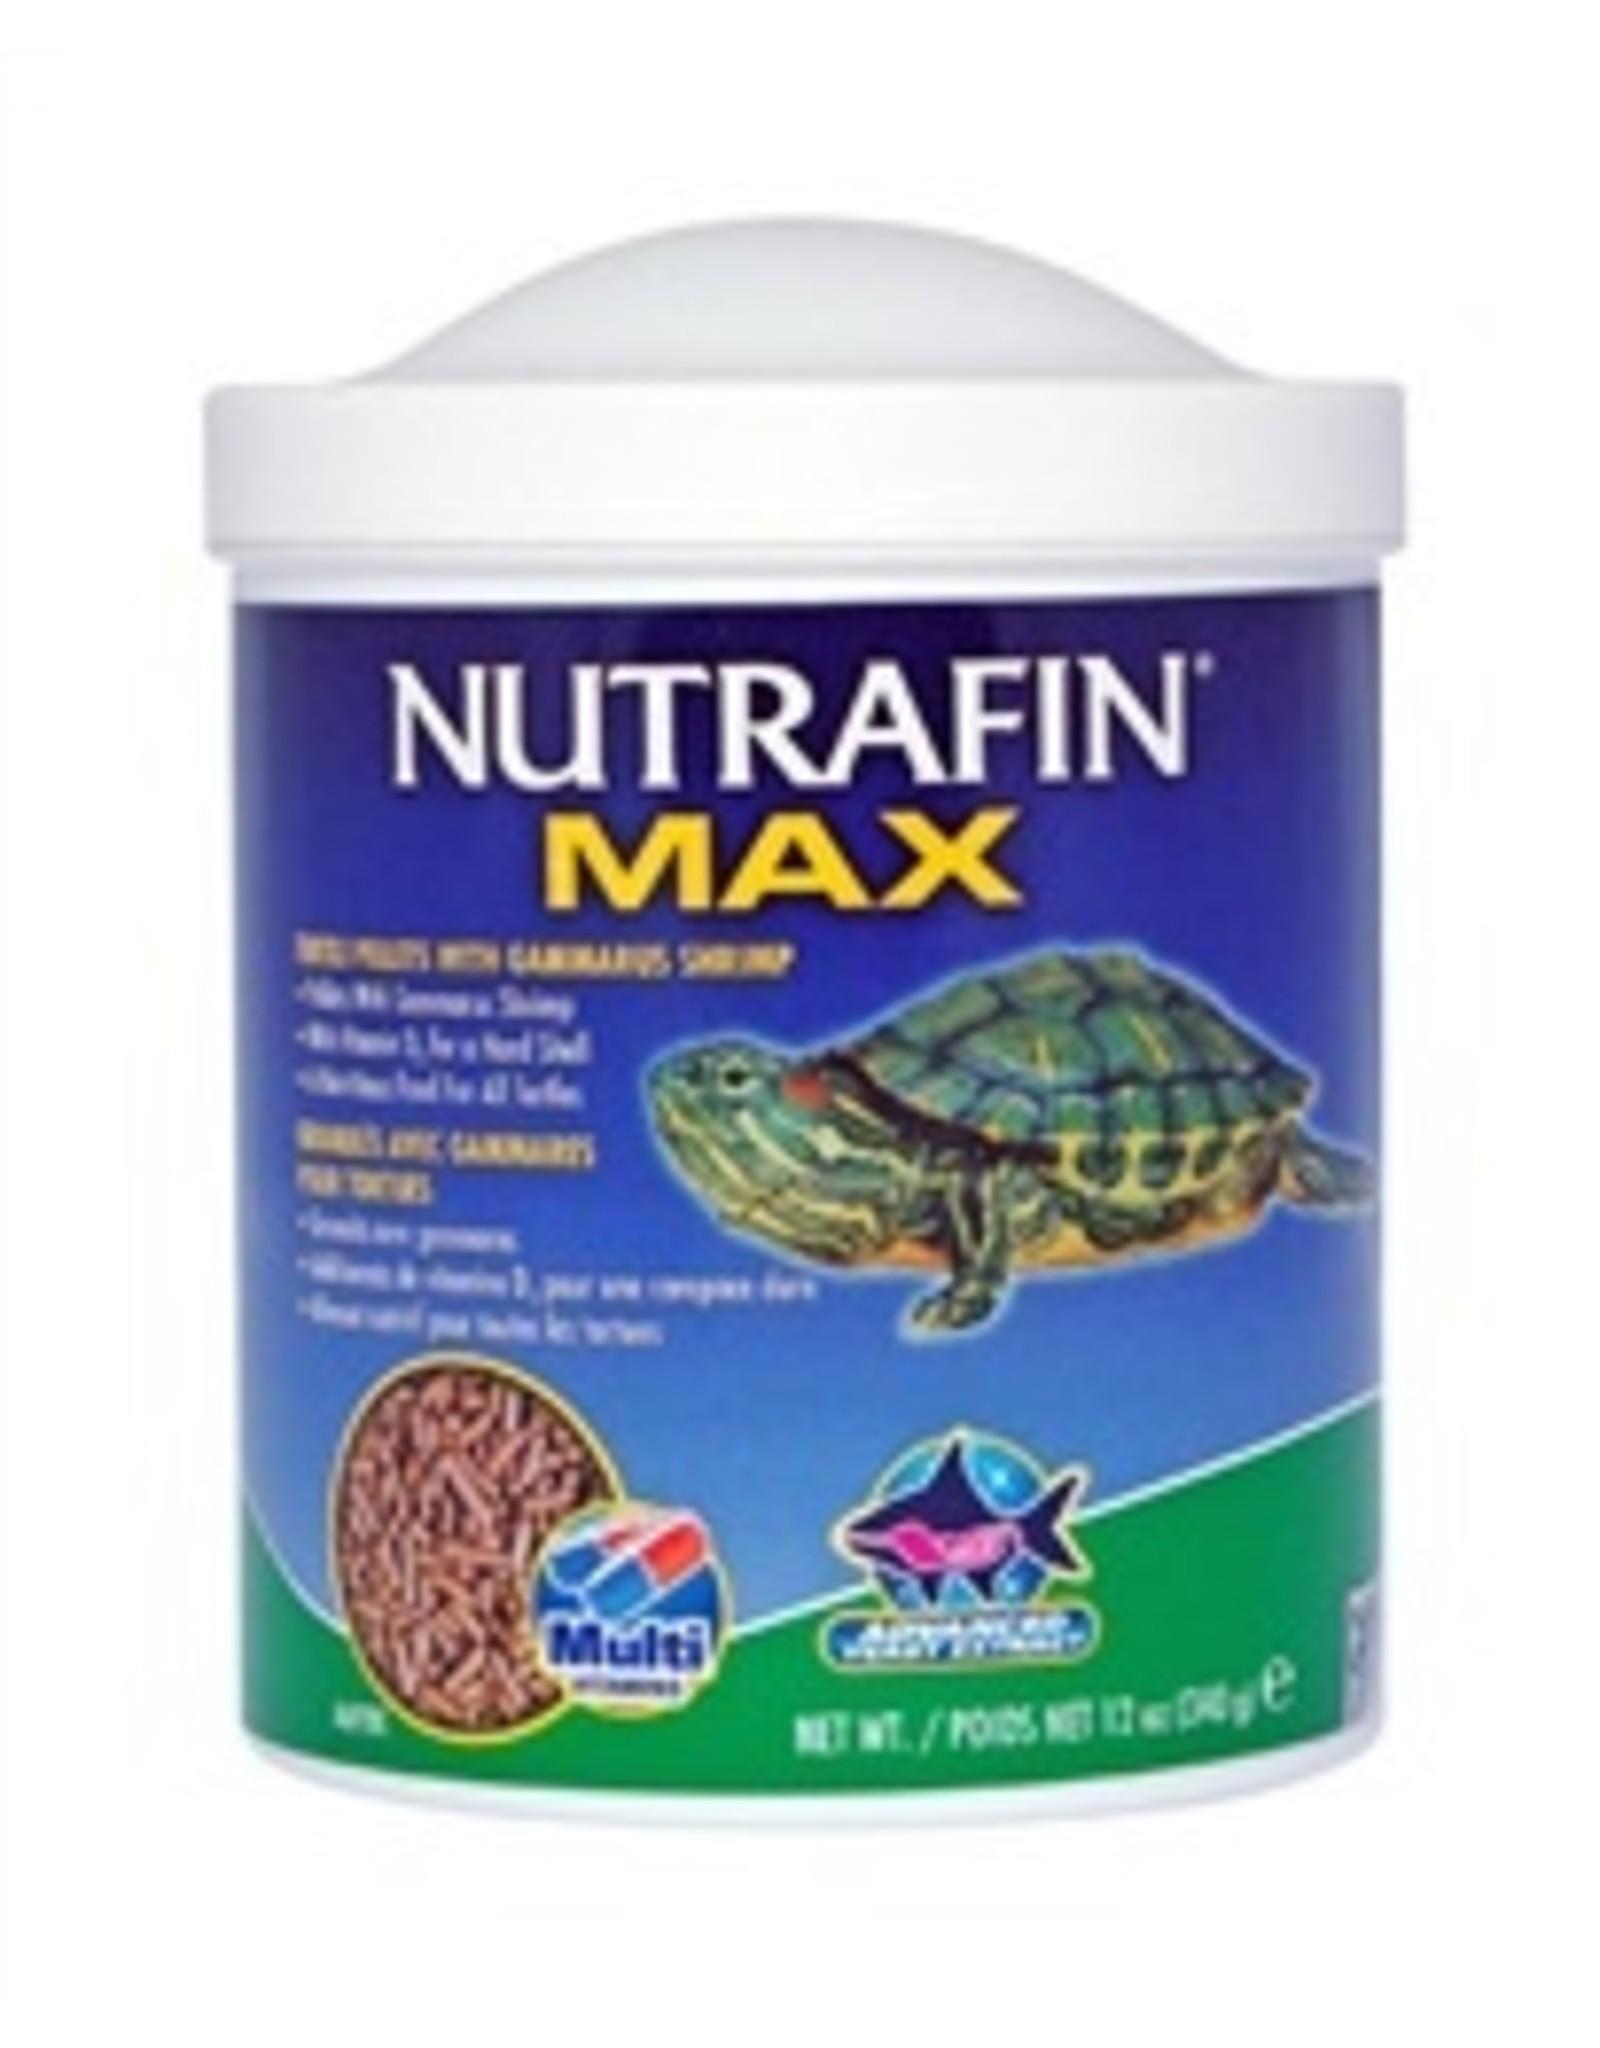 NutraFin NUTRAFIN Max Turtle Gammarus Pellets